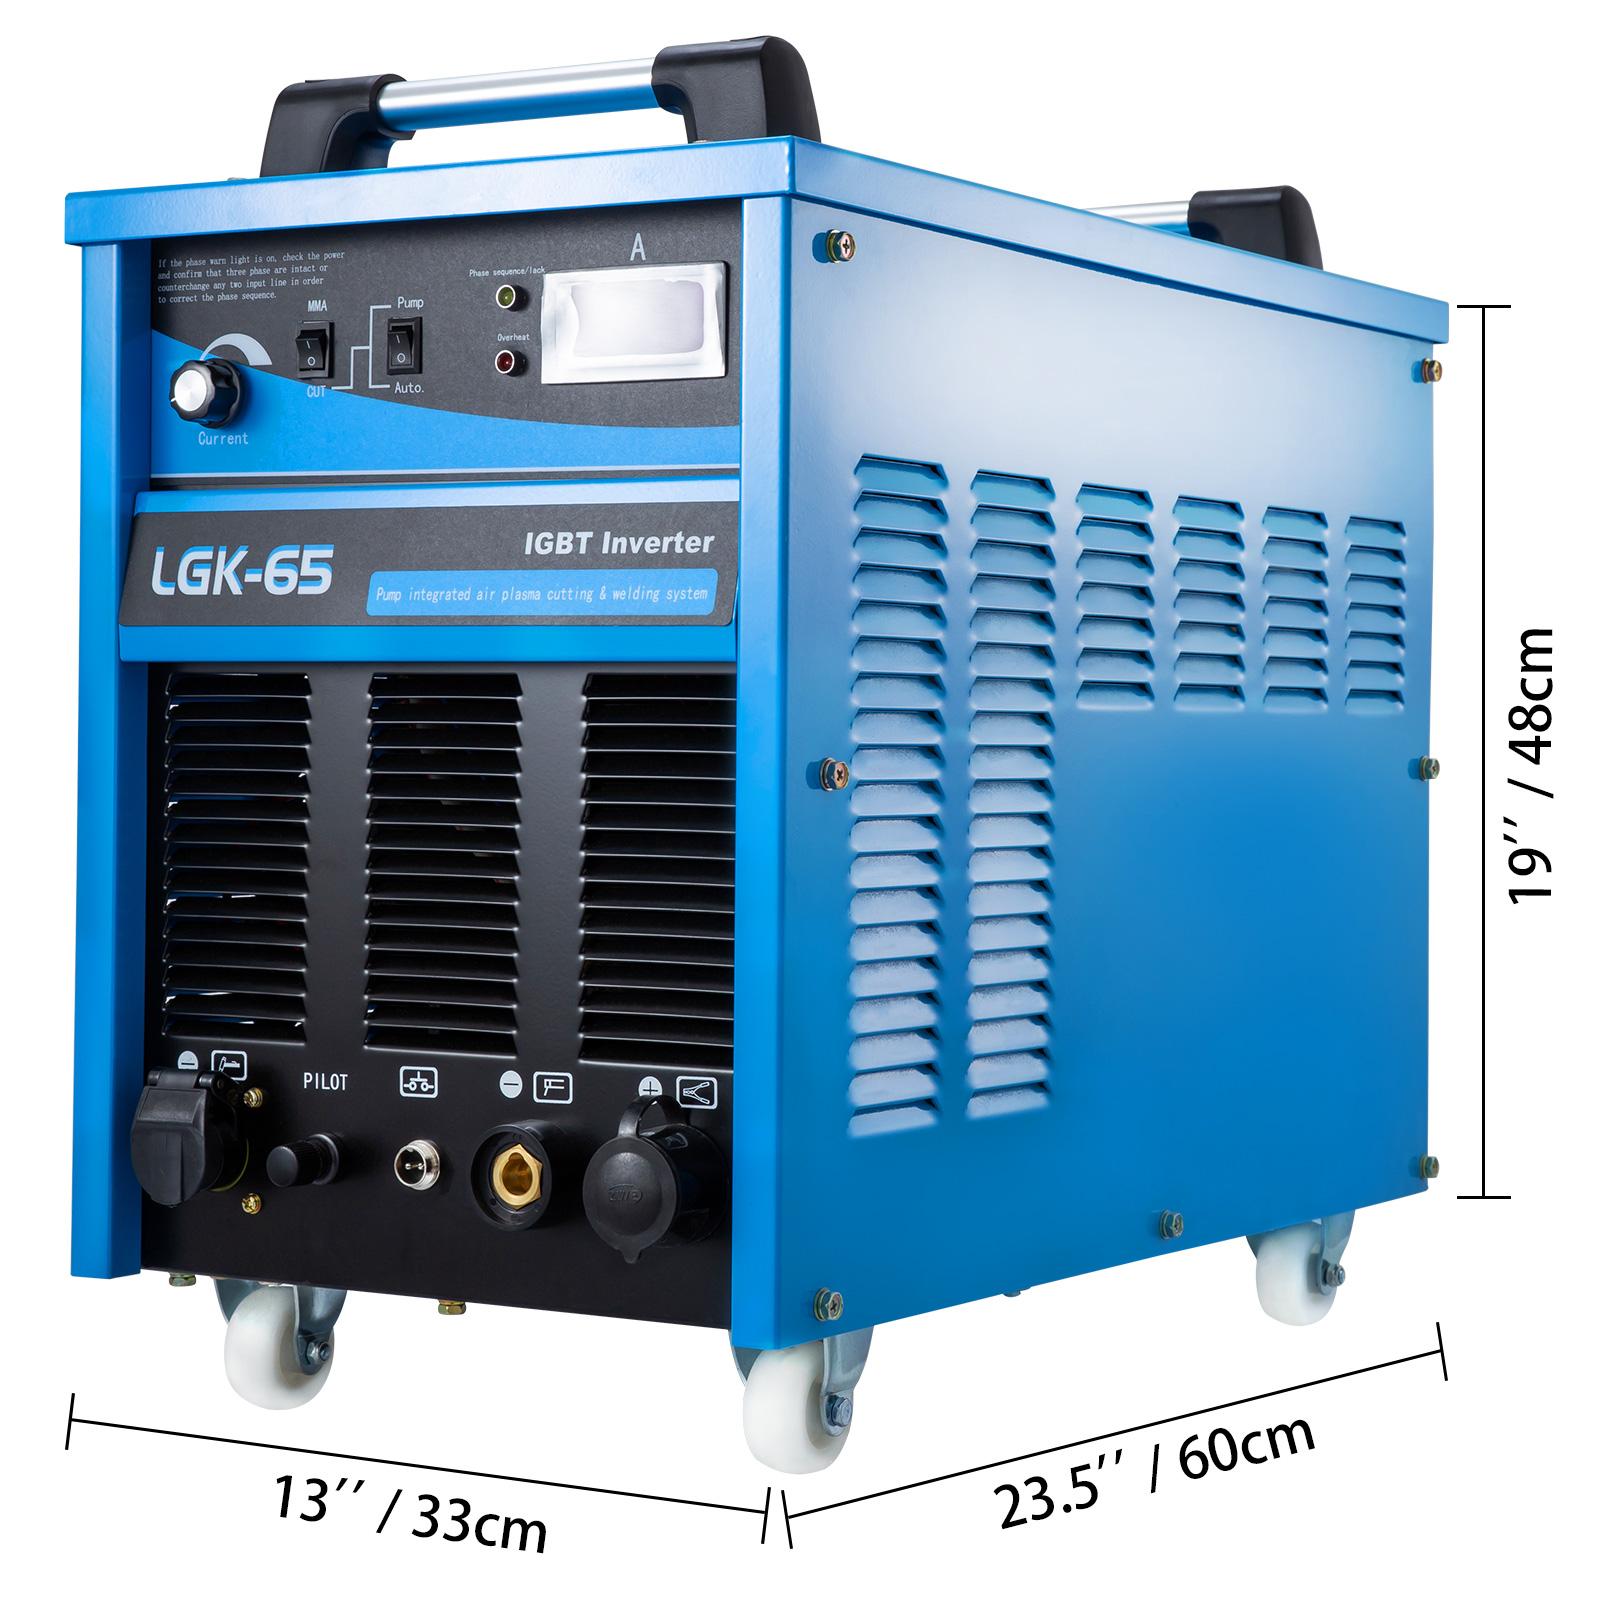 40-85A-Plasma-Cutter-Built-In-Air-Compressor-Inverter-Cutting-Machine-Cut-35mm thumbnail 44